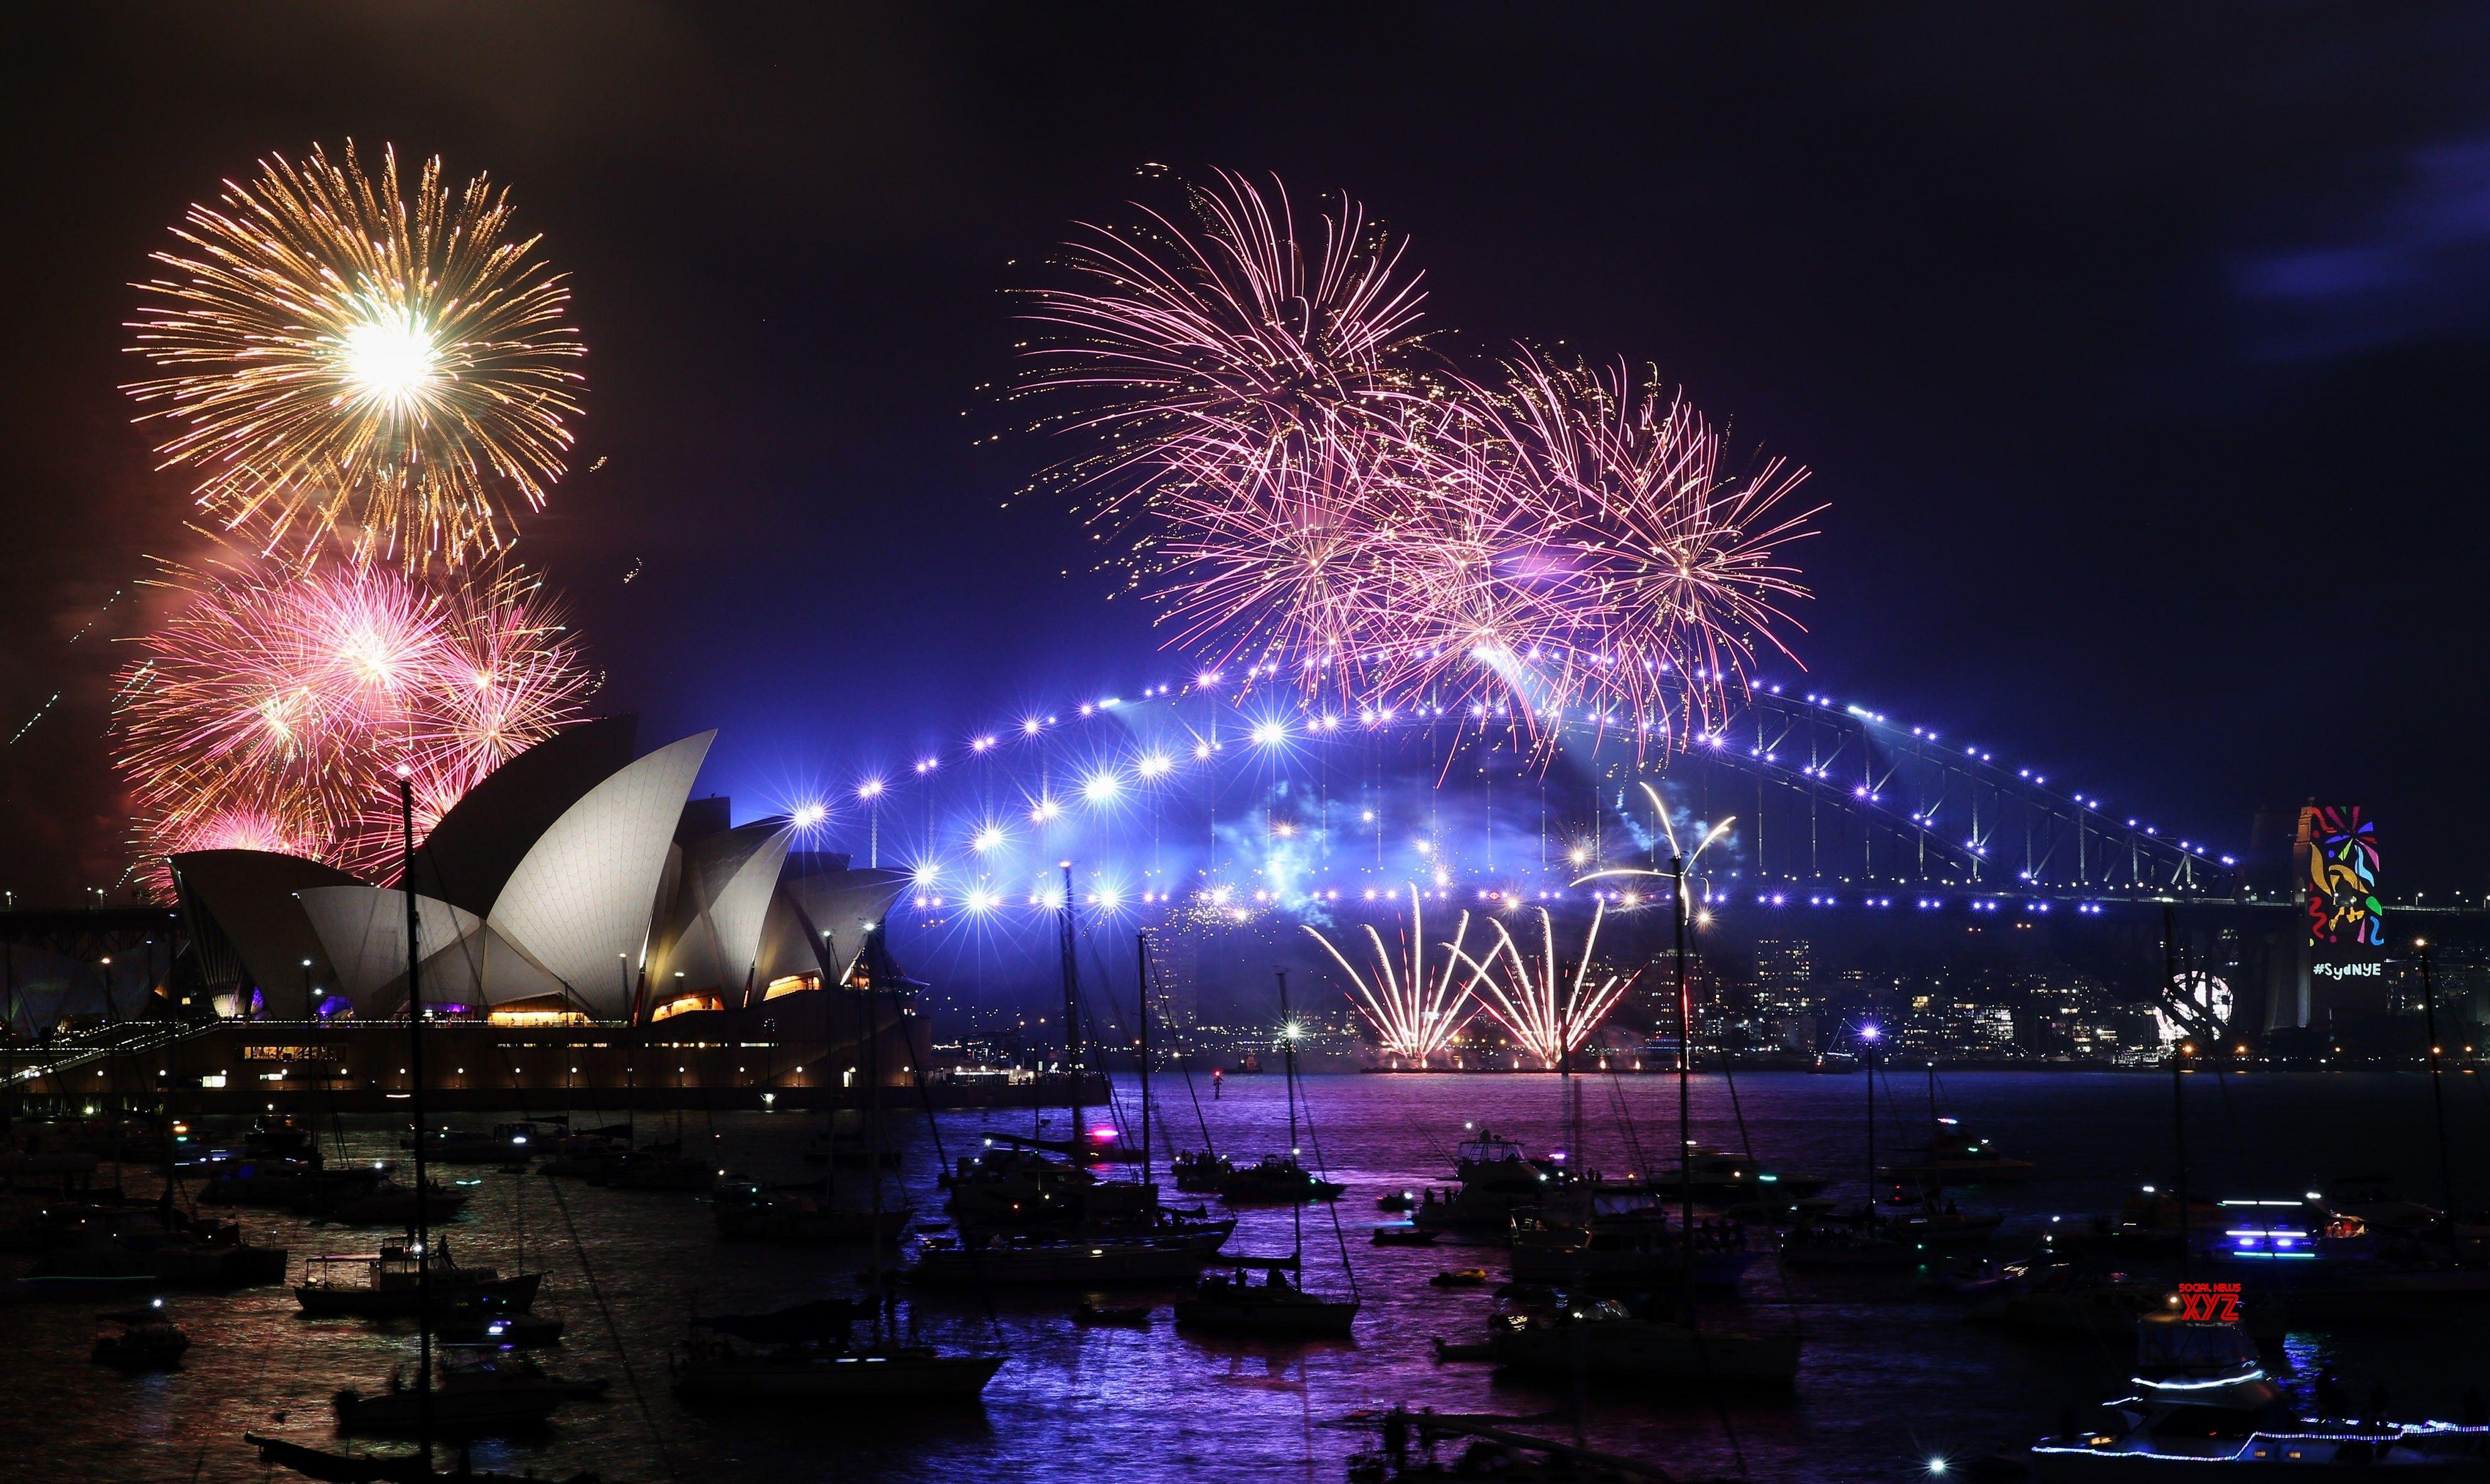 Thousands flee fireworks explosion on Australia beach - Social News XYZ